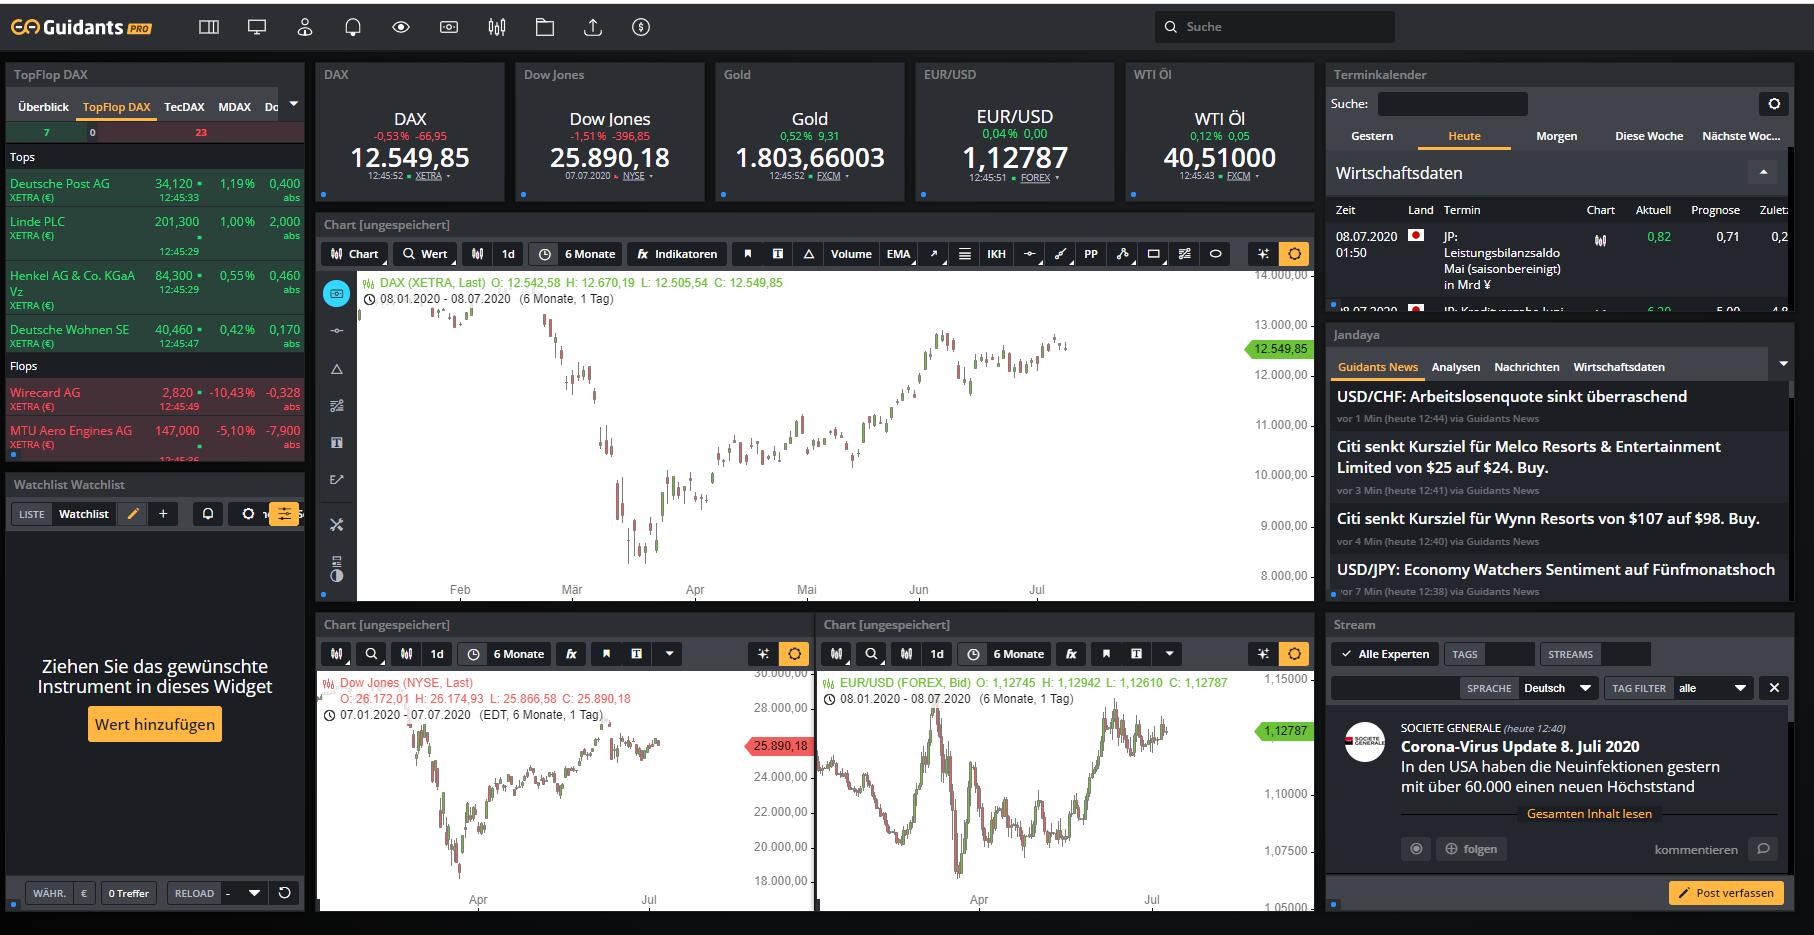 Traden-lernen-So-klappt-der-Einstieg-in-den-Börsenhandel-Philipp-Berger-GodmodeTrader.de-2